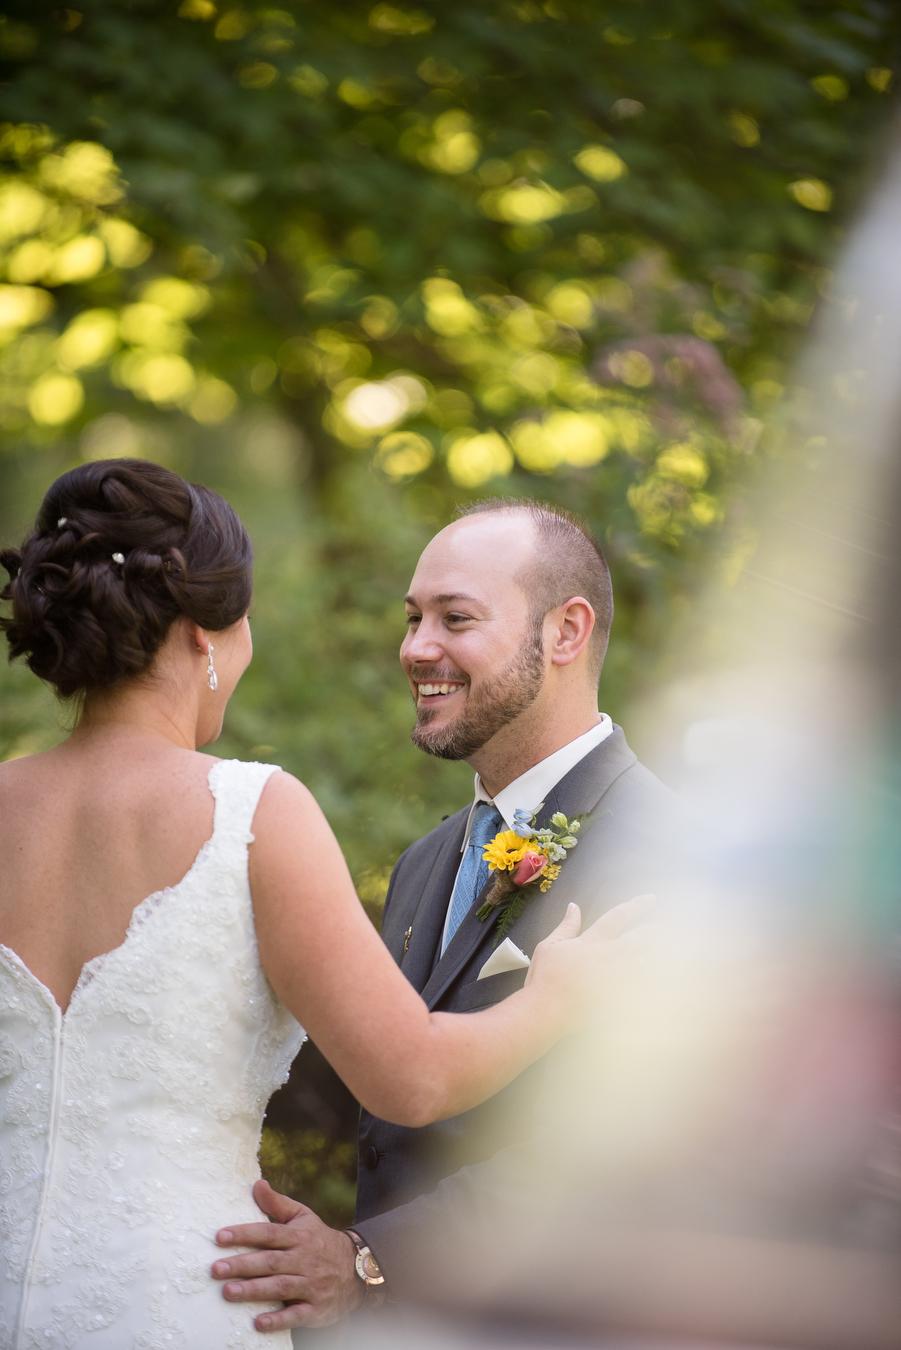 Karlo Gesner Photography Chanteclaire Farm Deep Creek Lake Lancaster Philadelphia Wedding Photographer 0016.JPG